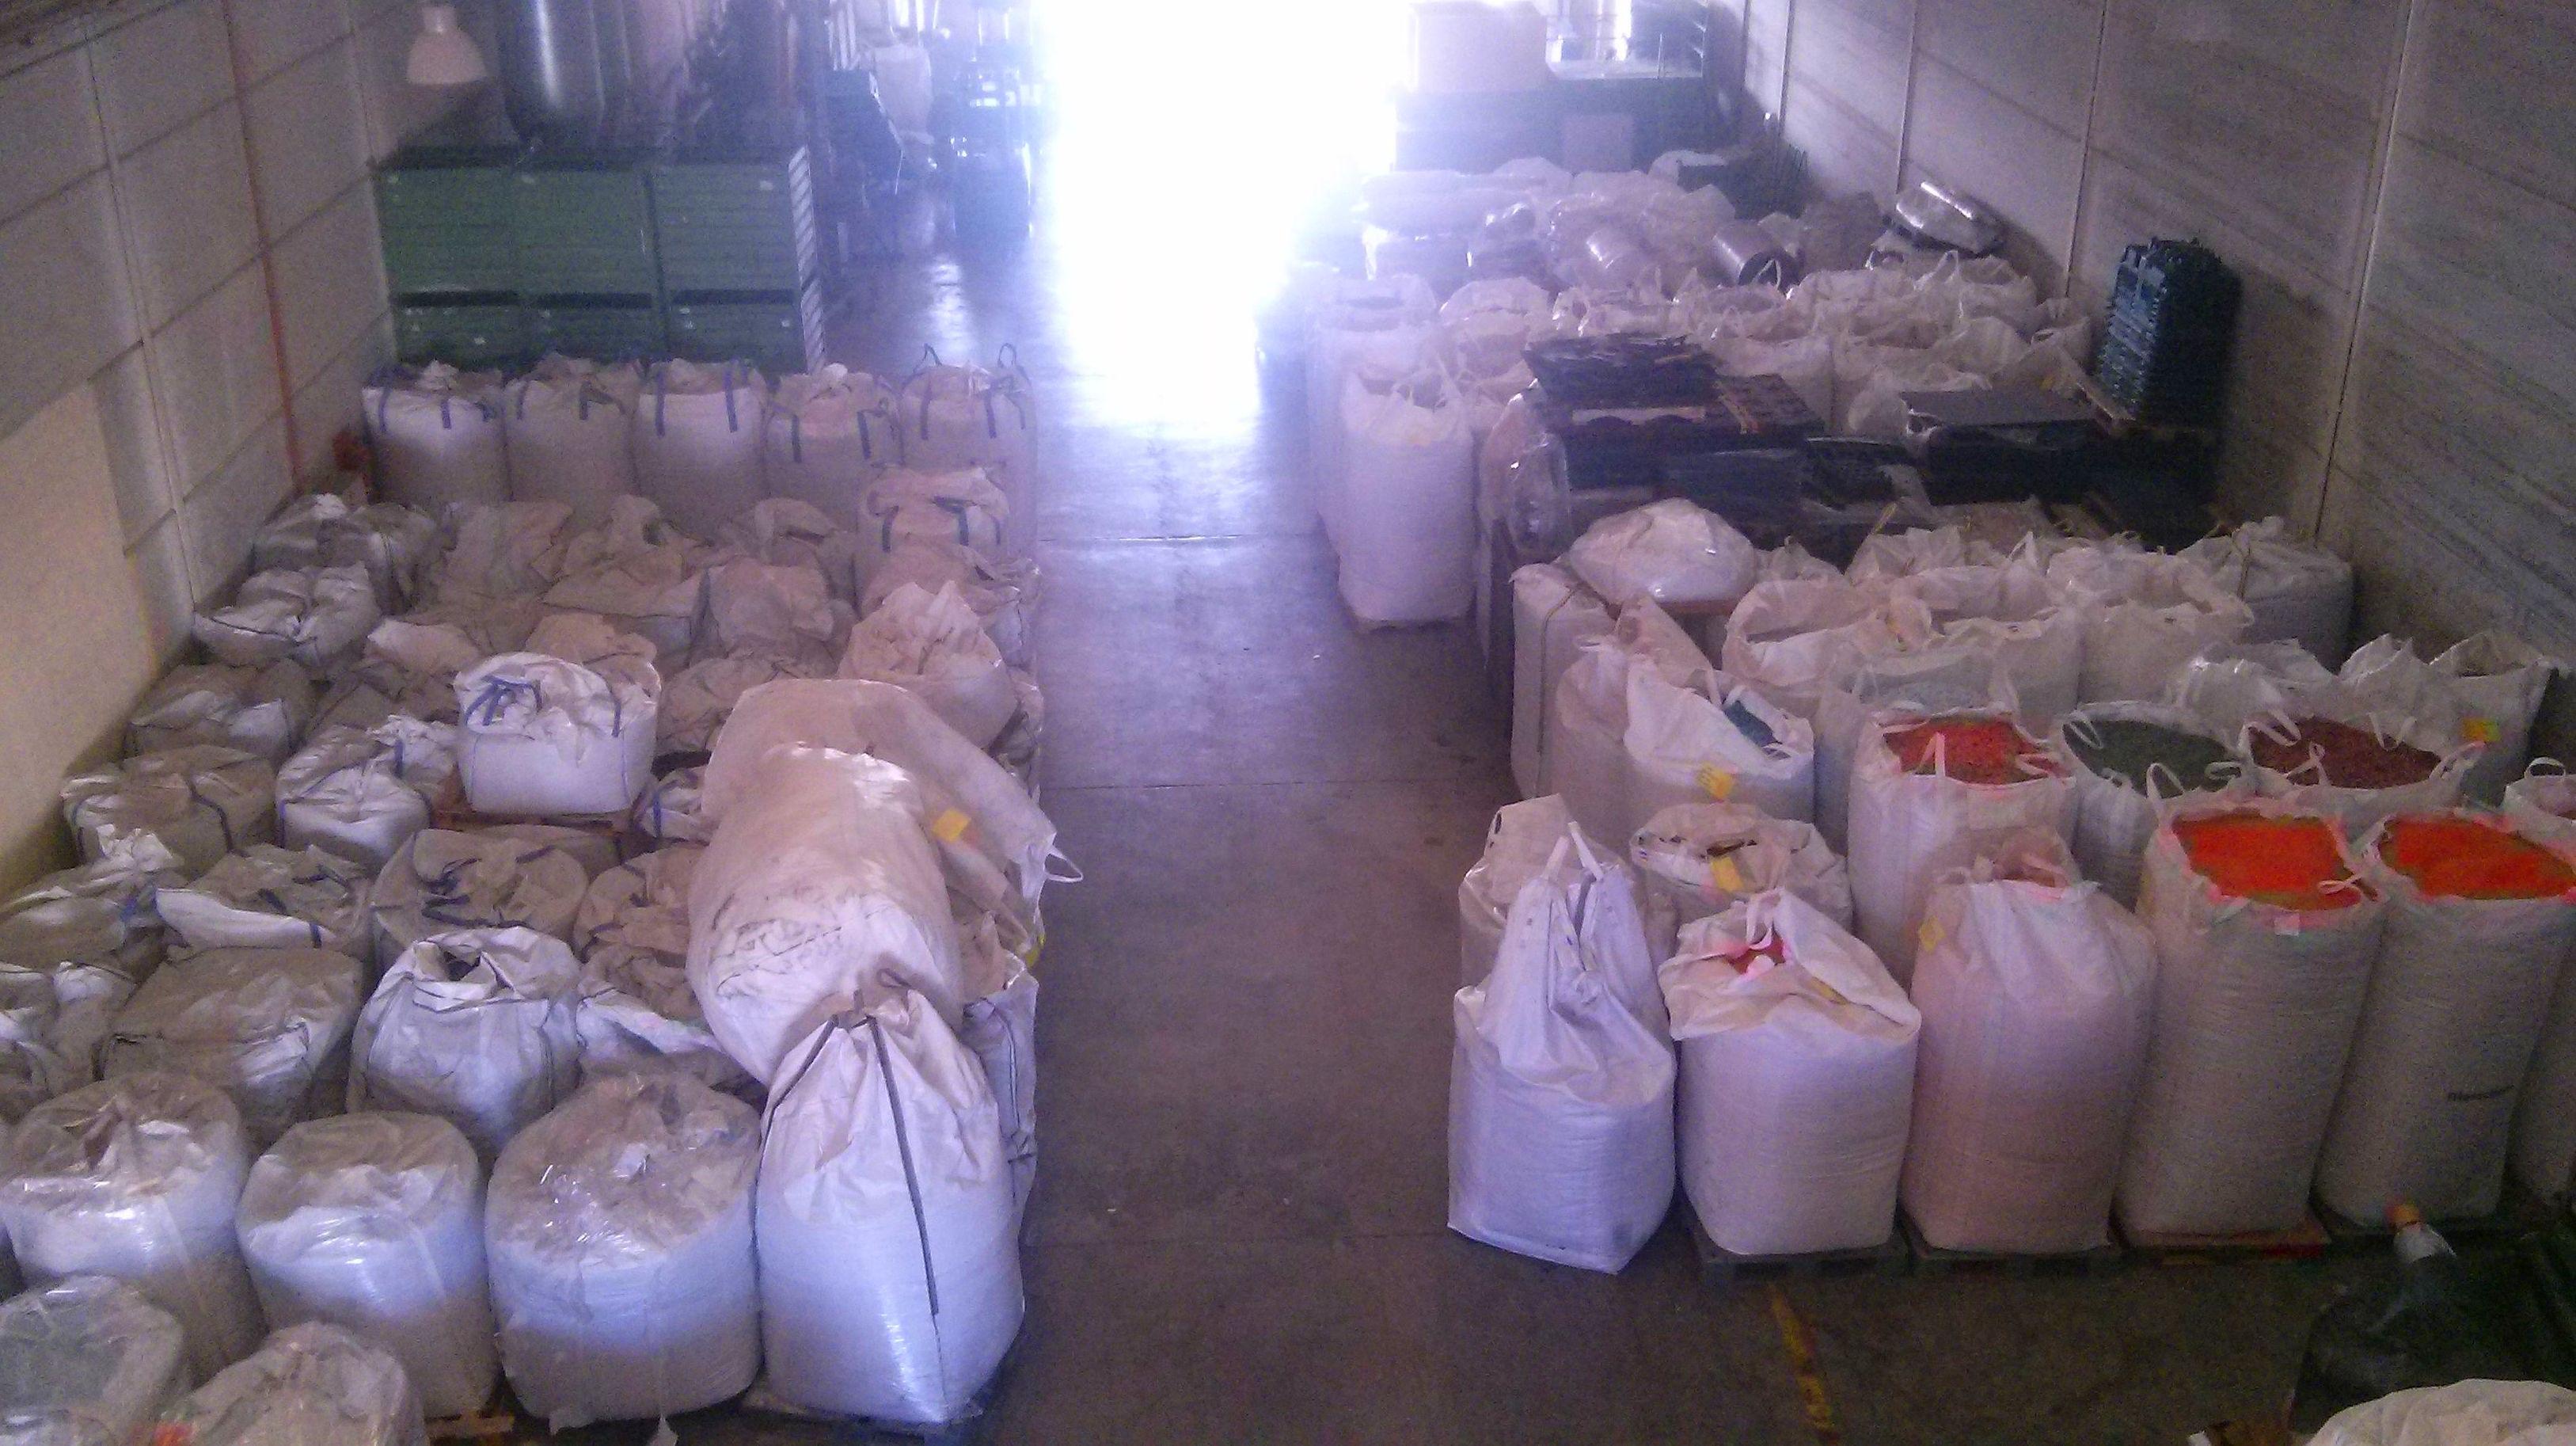 Foto 7 de Reciclaje de residuos en Manises | PalePlast, S. L.